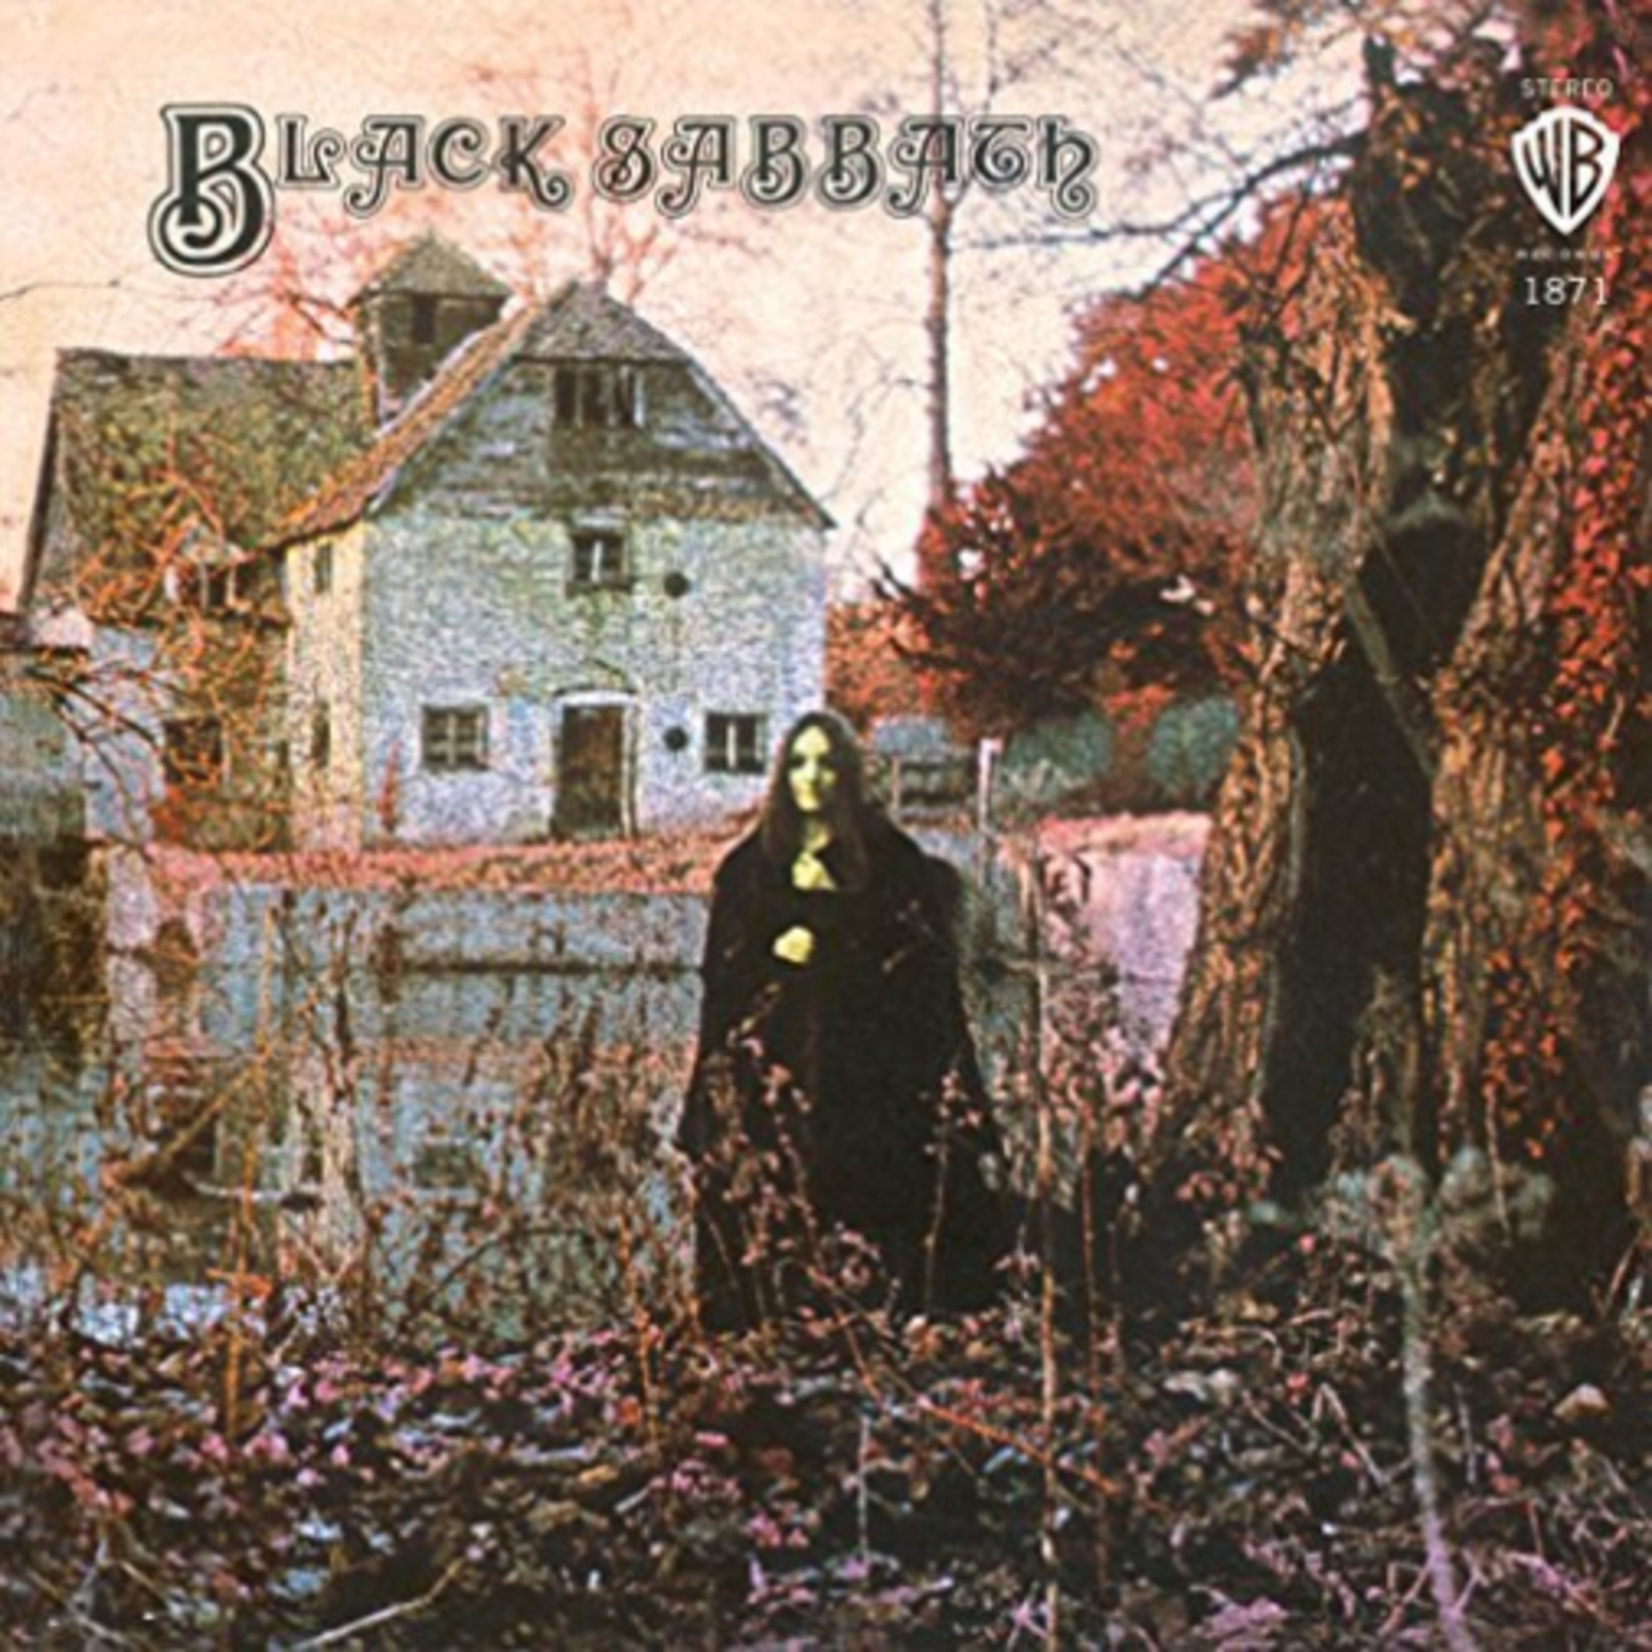 BLACK SABBATH BLACK SABBATH (2LP)